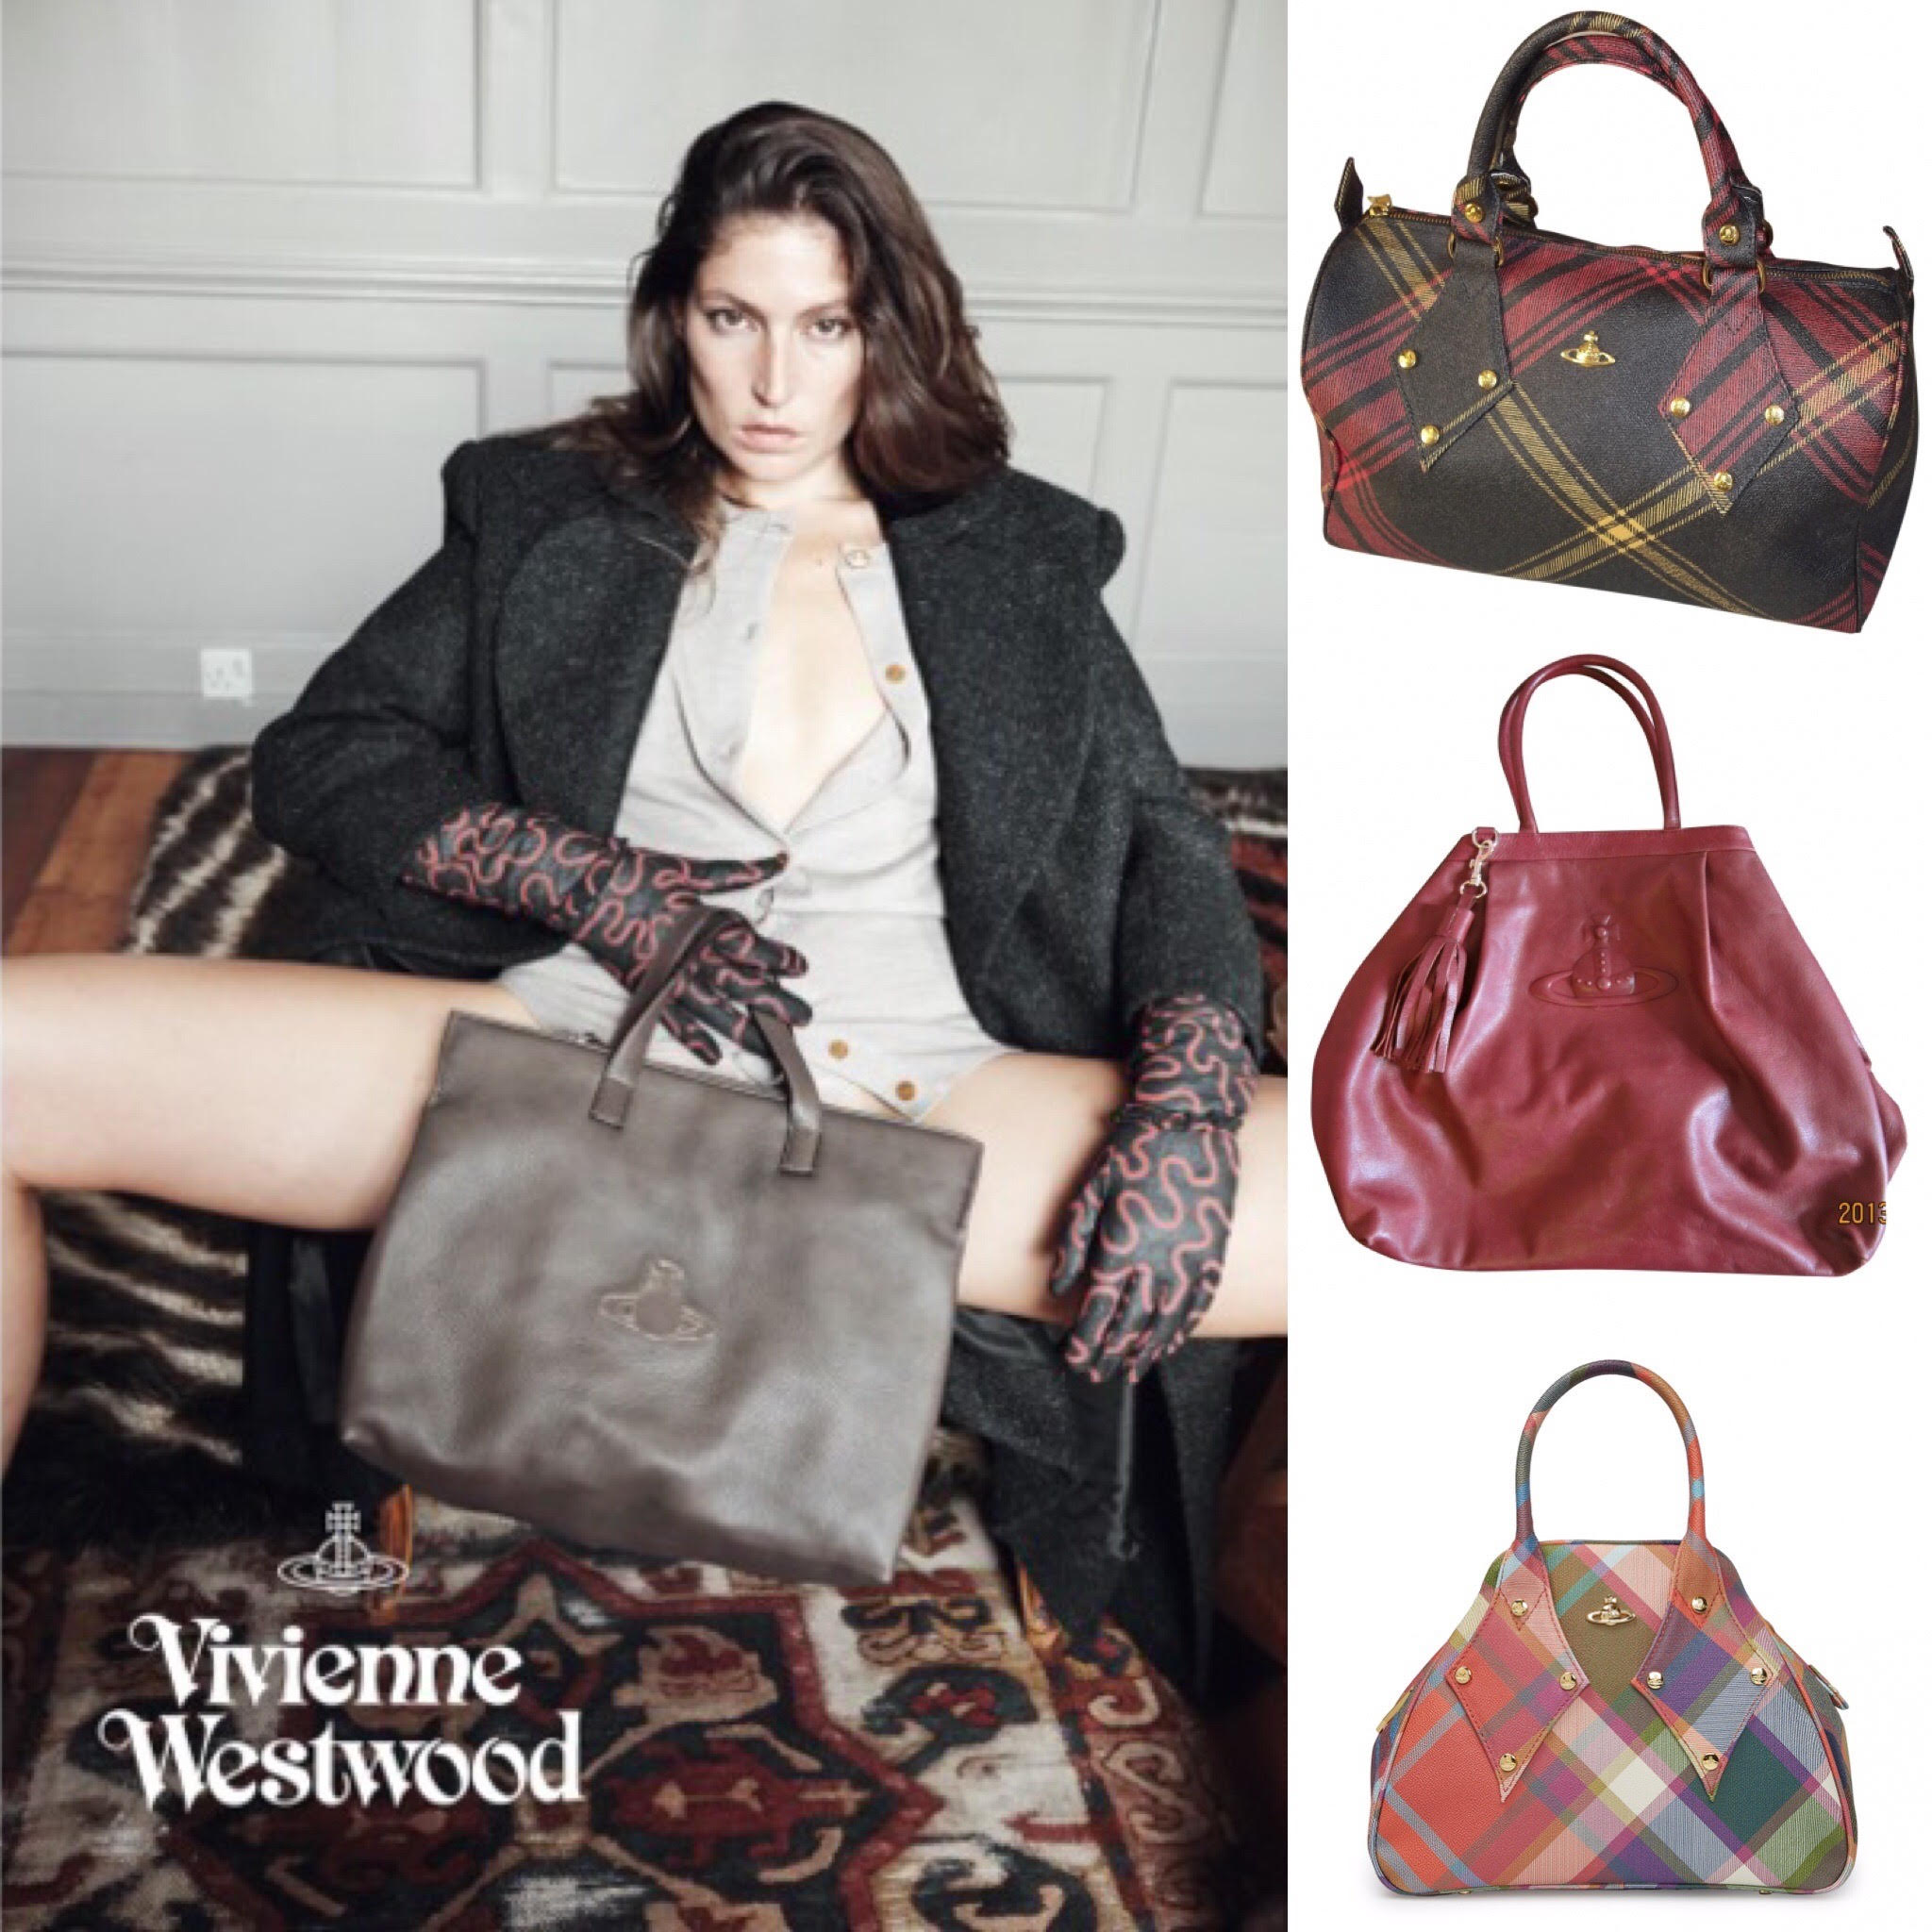 Vivienne Westwood Fashion Icon